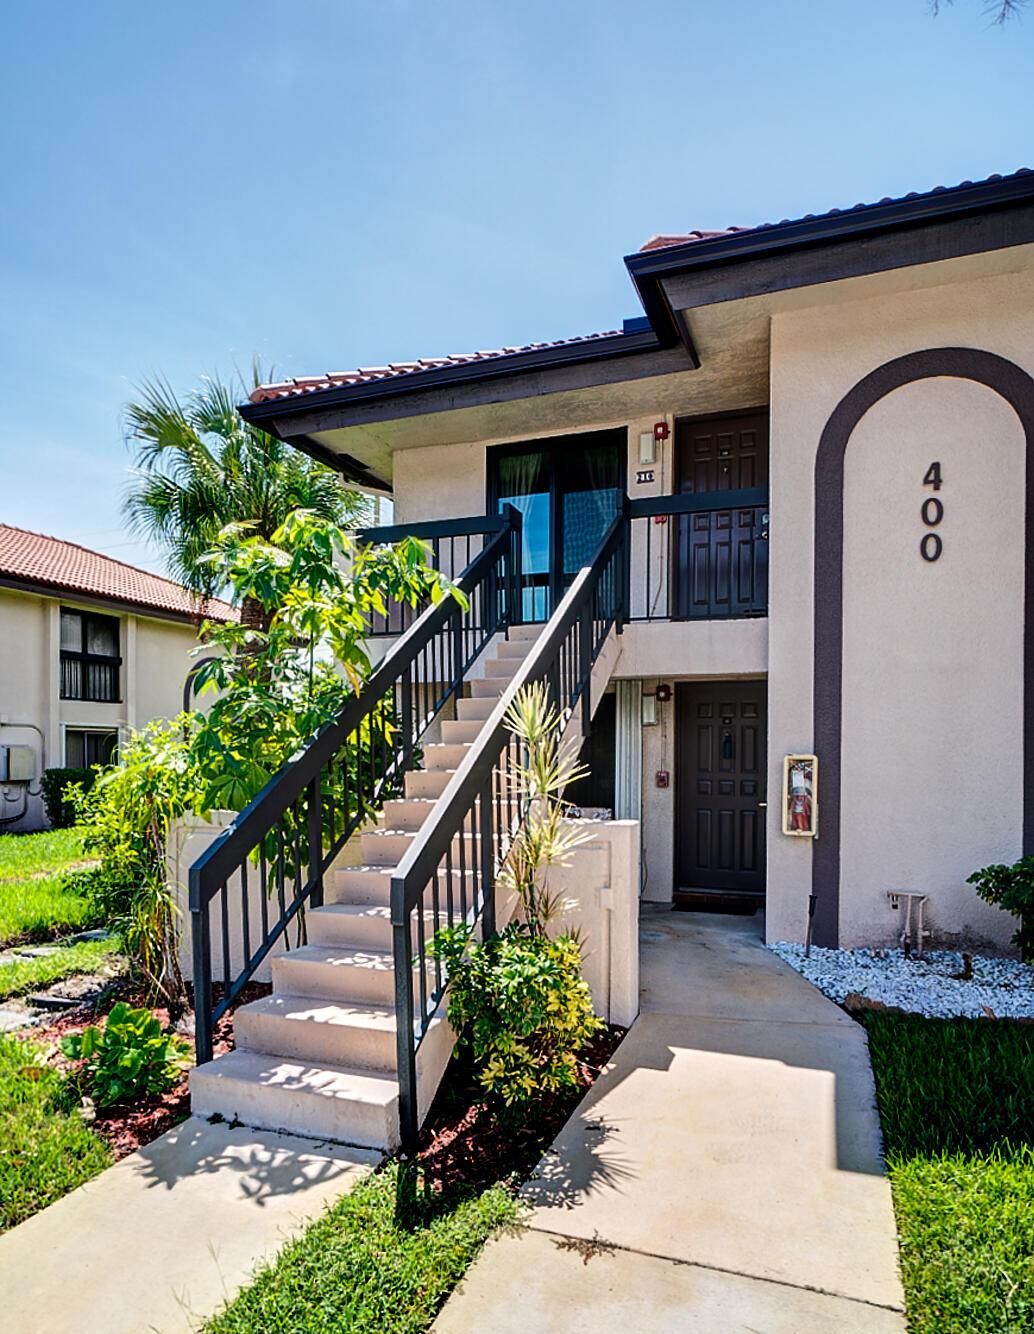 400 E Club Circle 110 Boca Raton, FL 33487